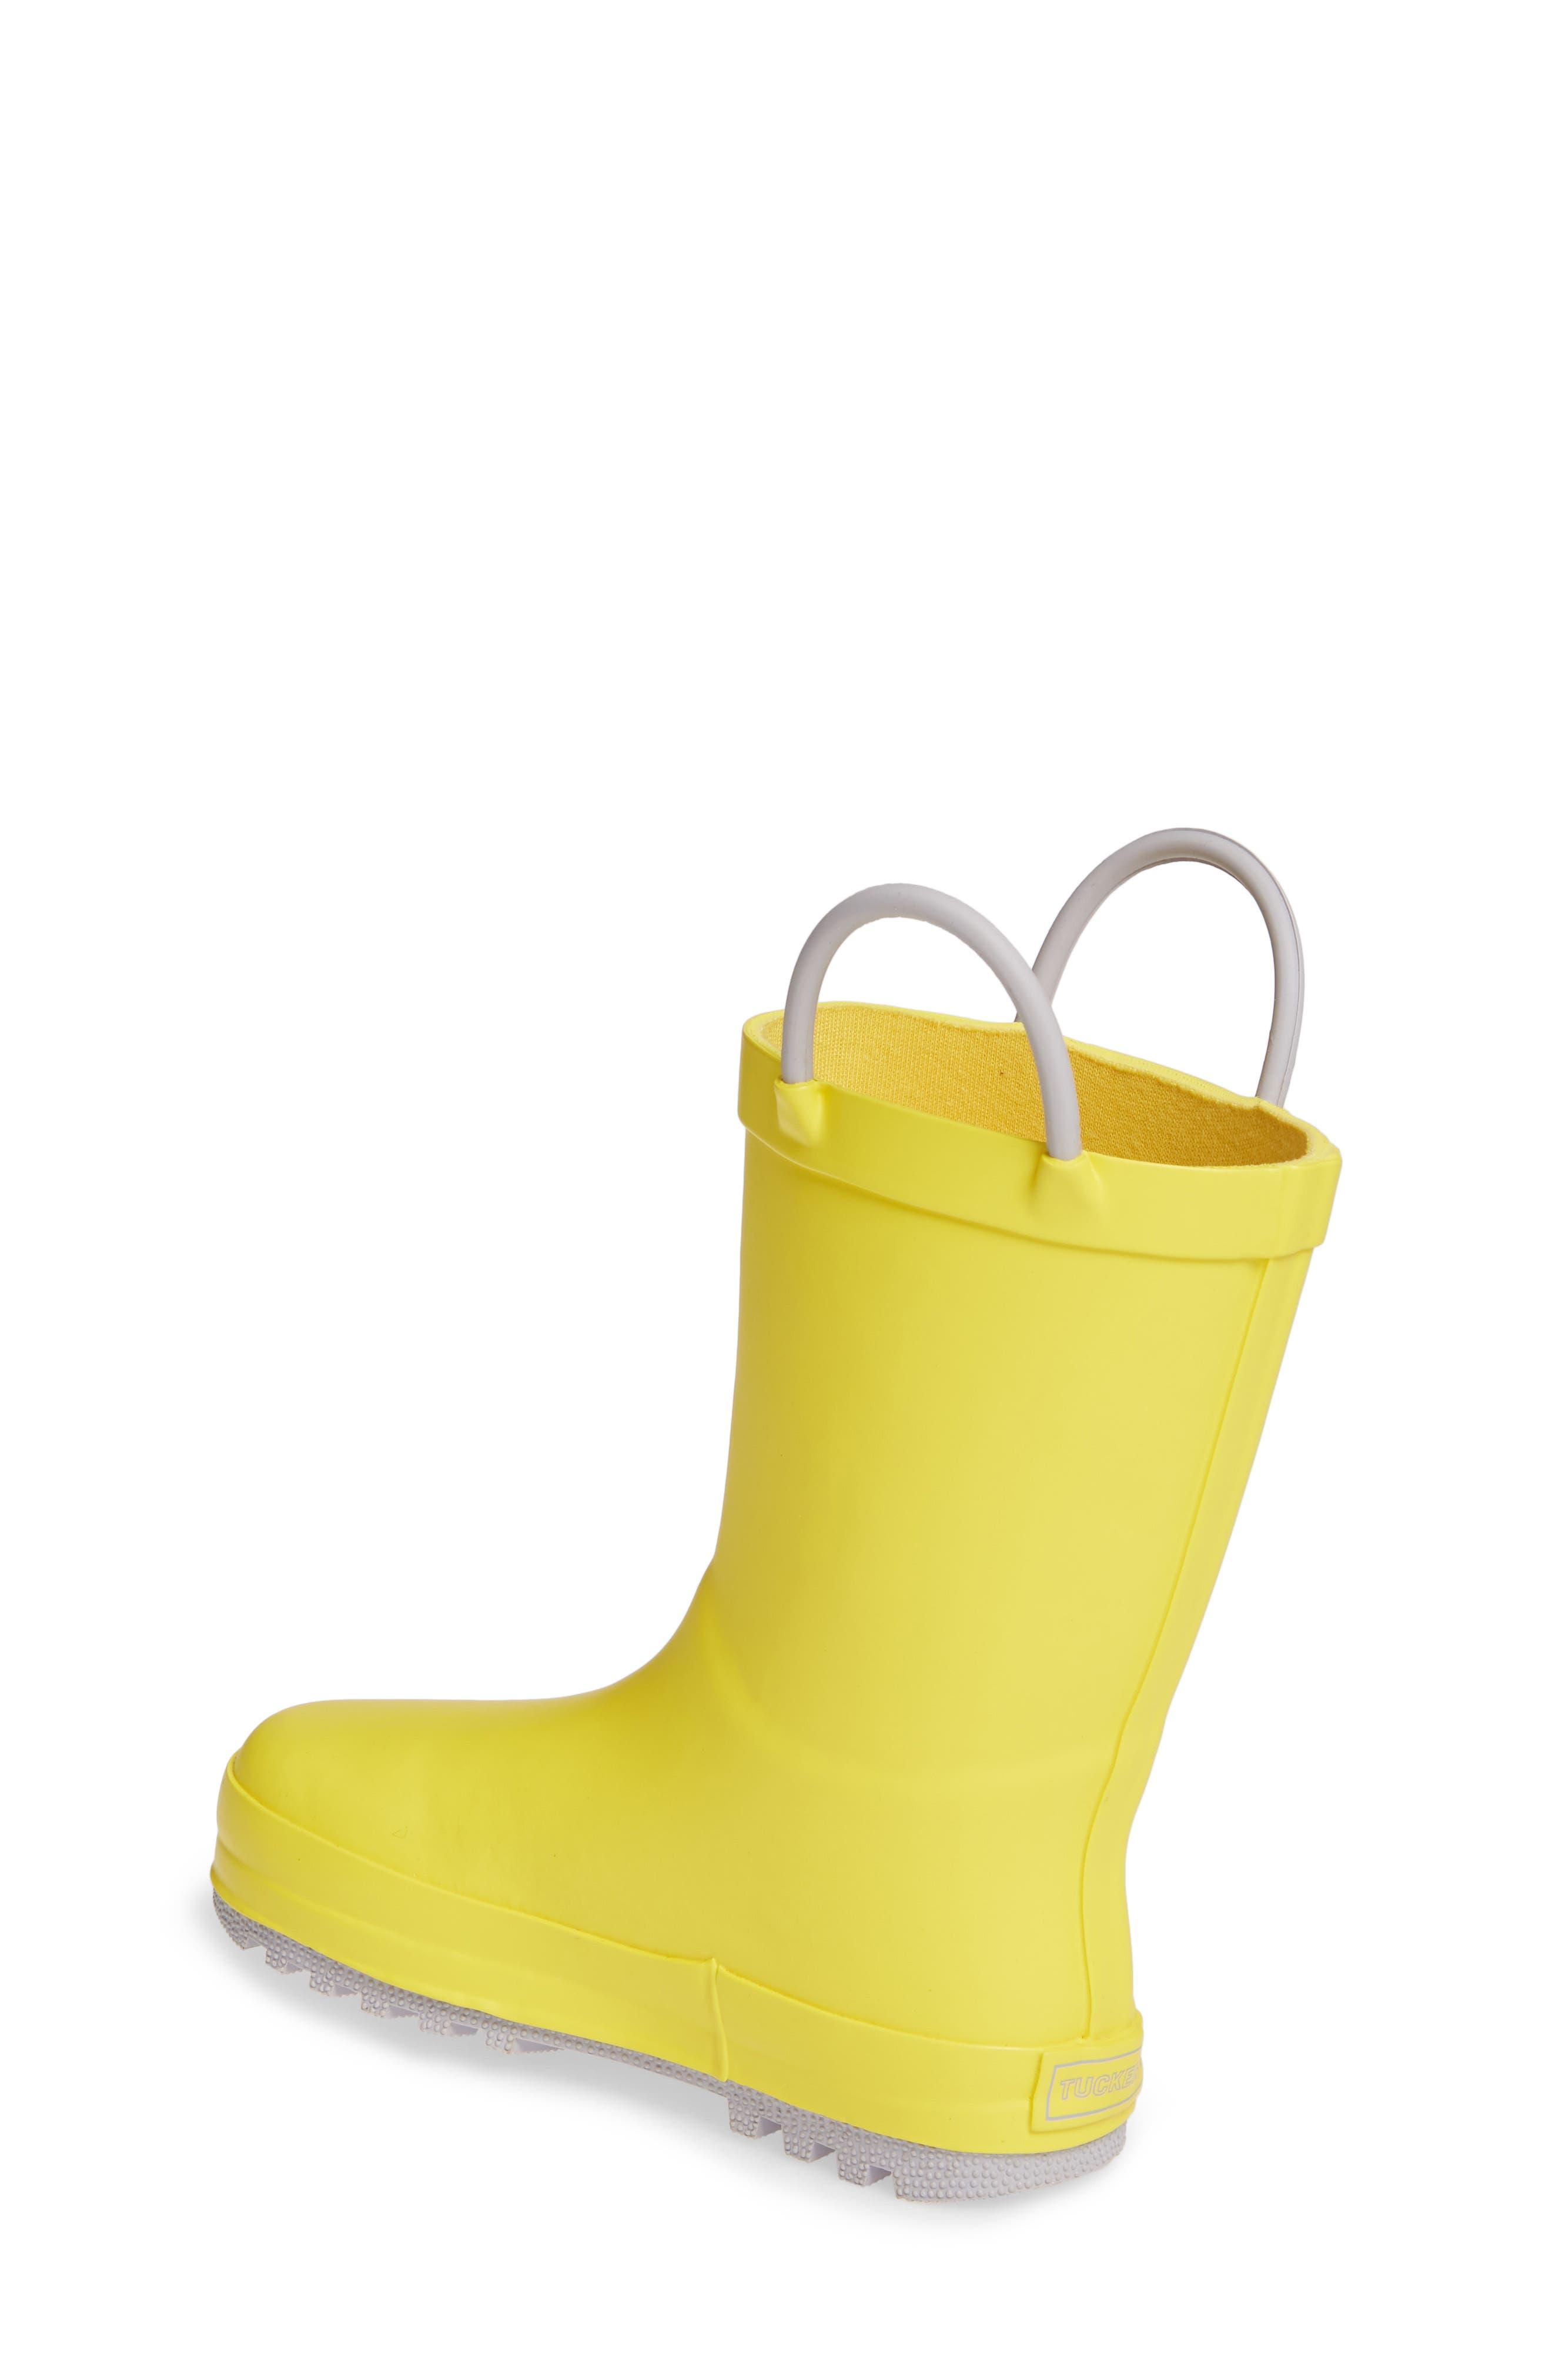 TUCKER + TATE,                             Puddle Rain Boot,                             Alternate thumbnail 2, color,                             YELLOW/ GREY RUBBER